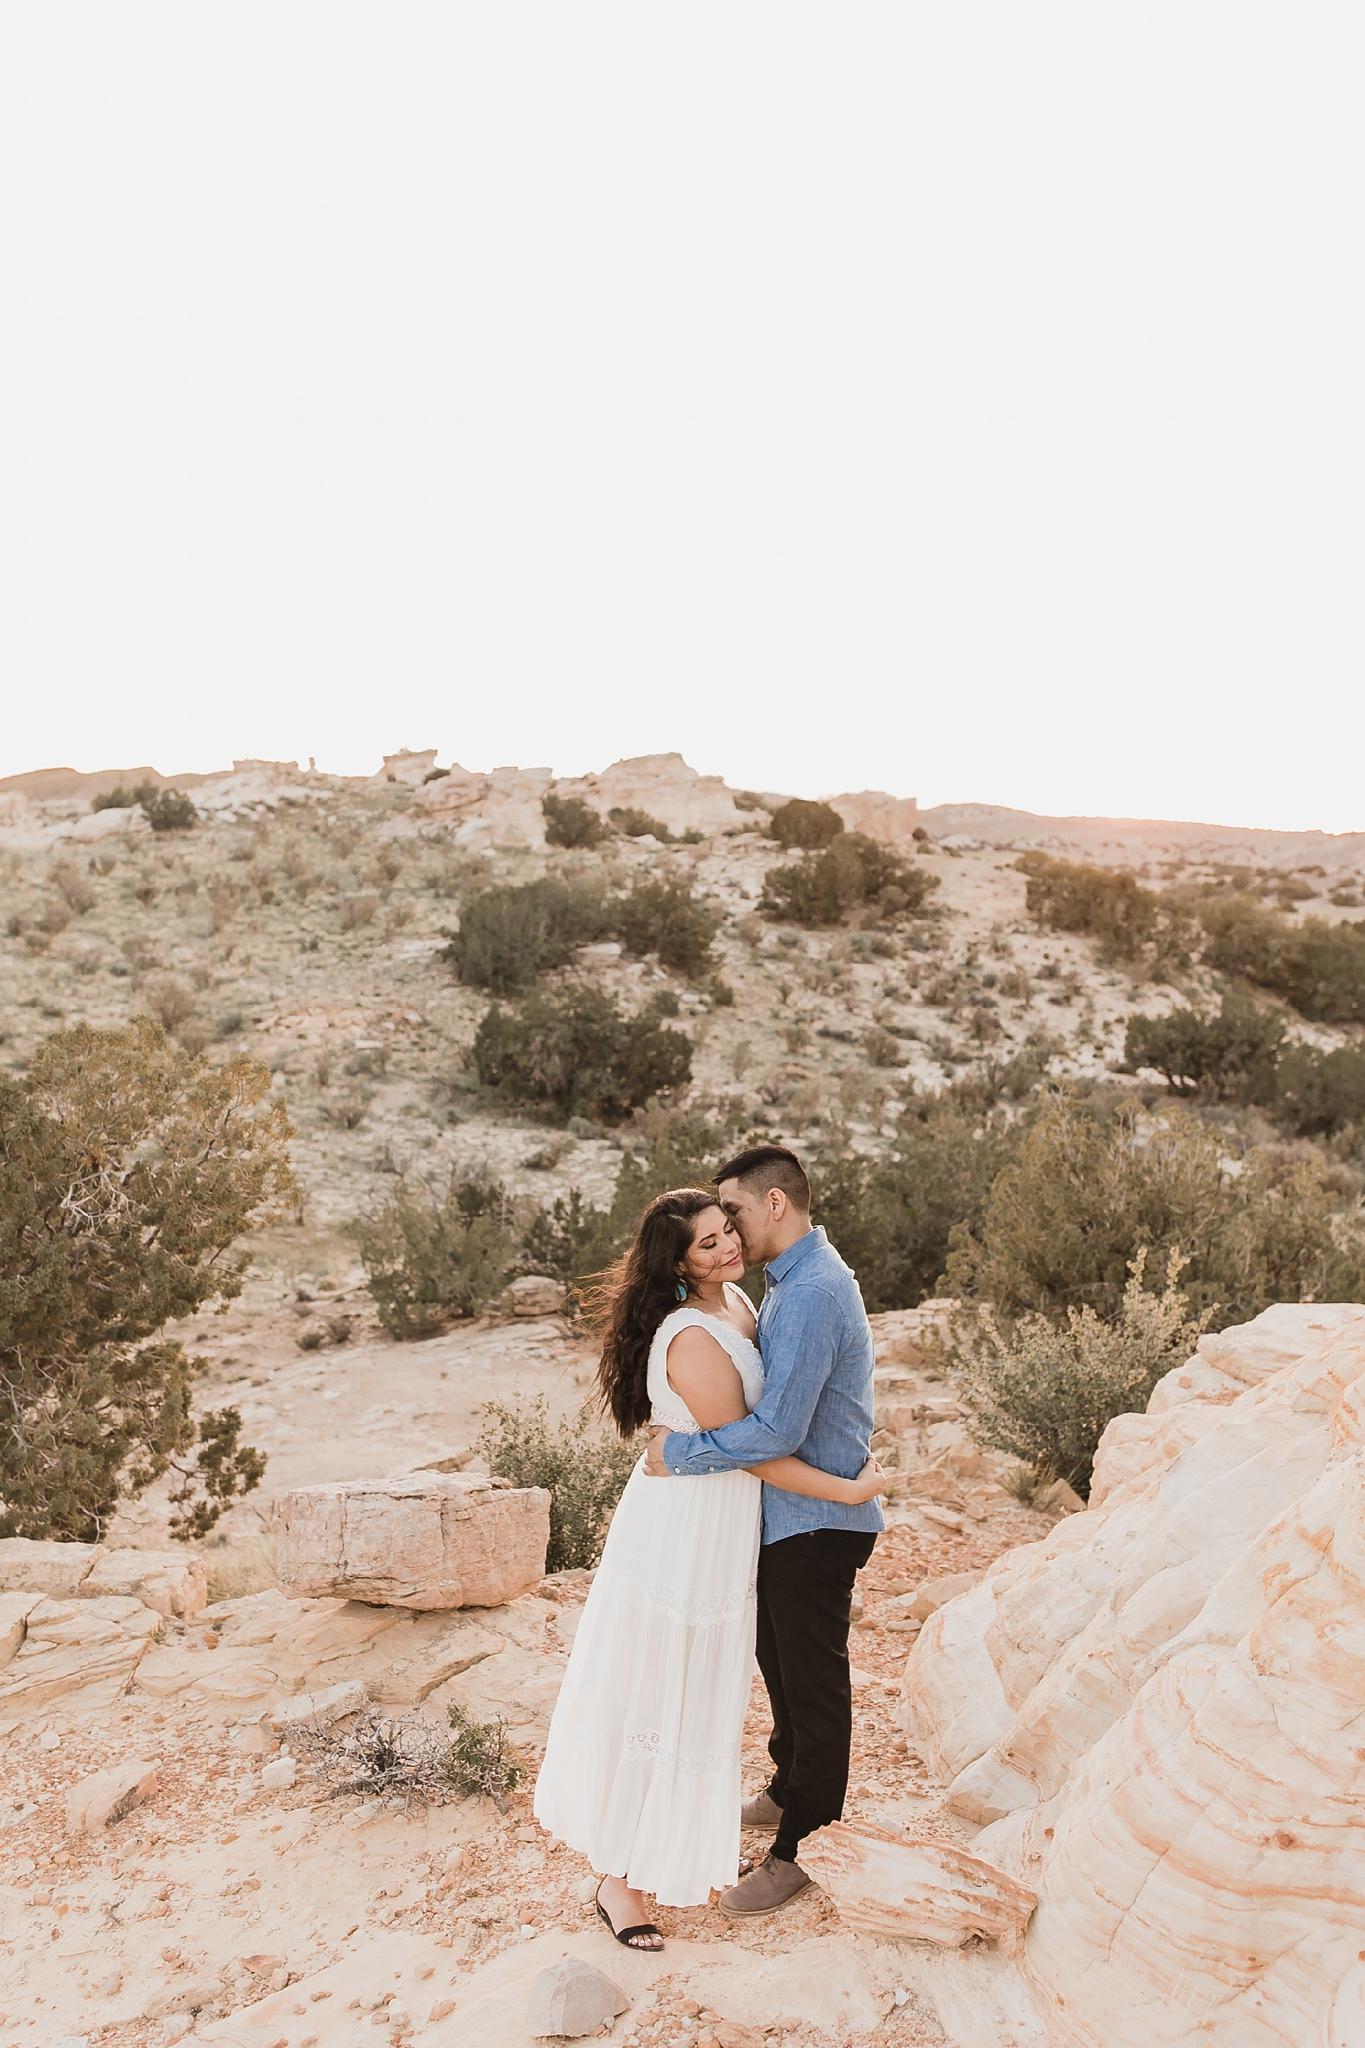 Alicia+lucia+photography+-+albuquerque+wedding+photographer+-+santa+fe+wedding+photography+-+new+mexico+wedding+photographer+-+new+mexico+wedding+-+new+mexico+engagement+-+white+mesa+engagement+-+desert+engagement_0009.jpg